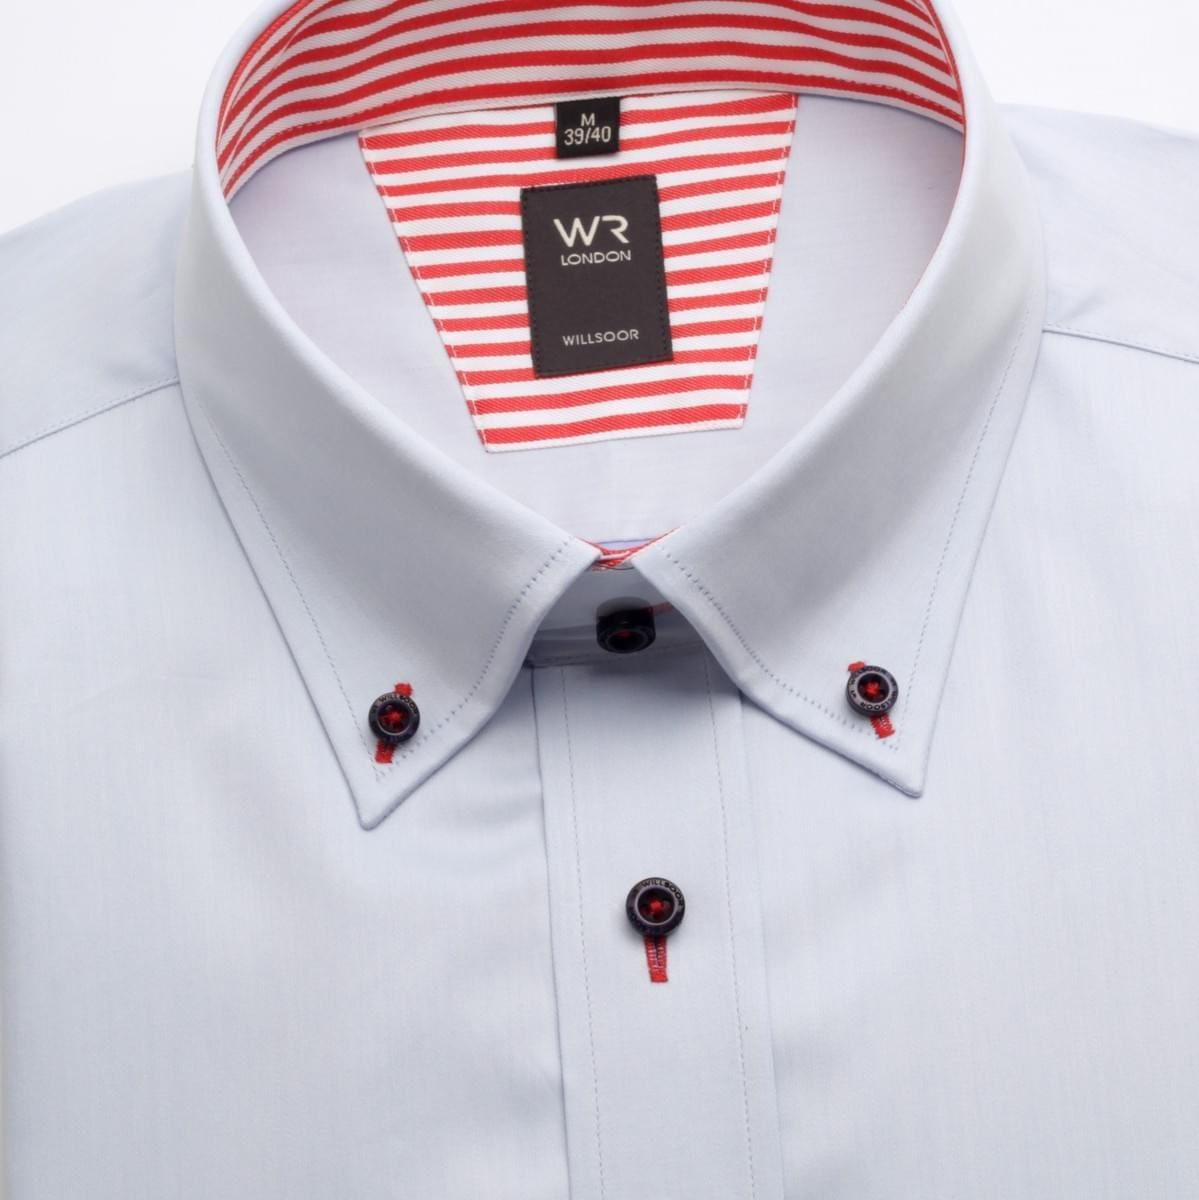 Willsoor Pánská košile WR London (výška 176-182) 1885 176-182 / M (39/40)